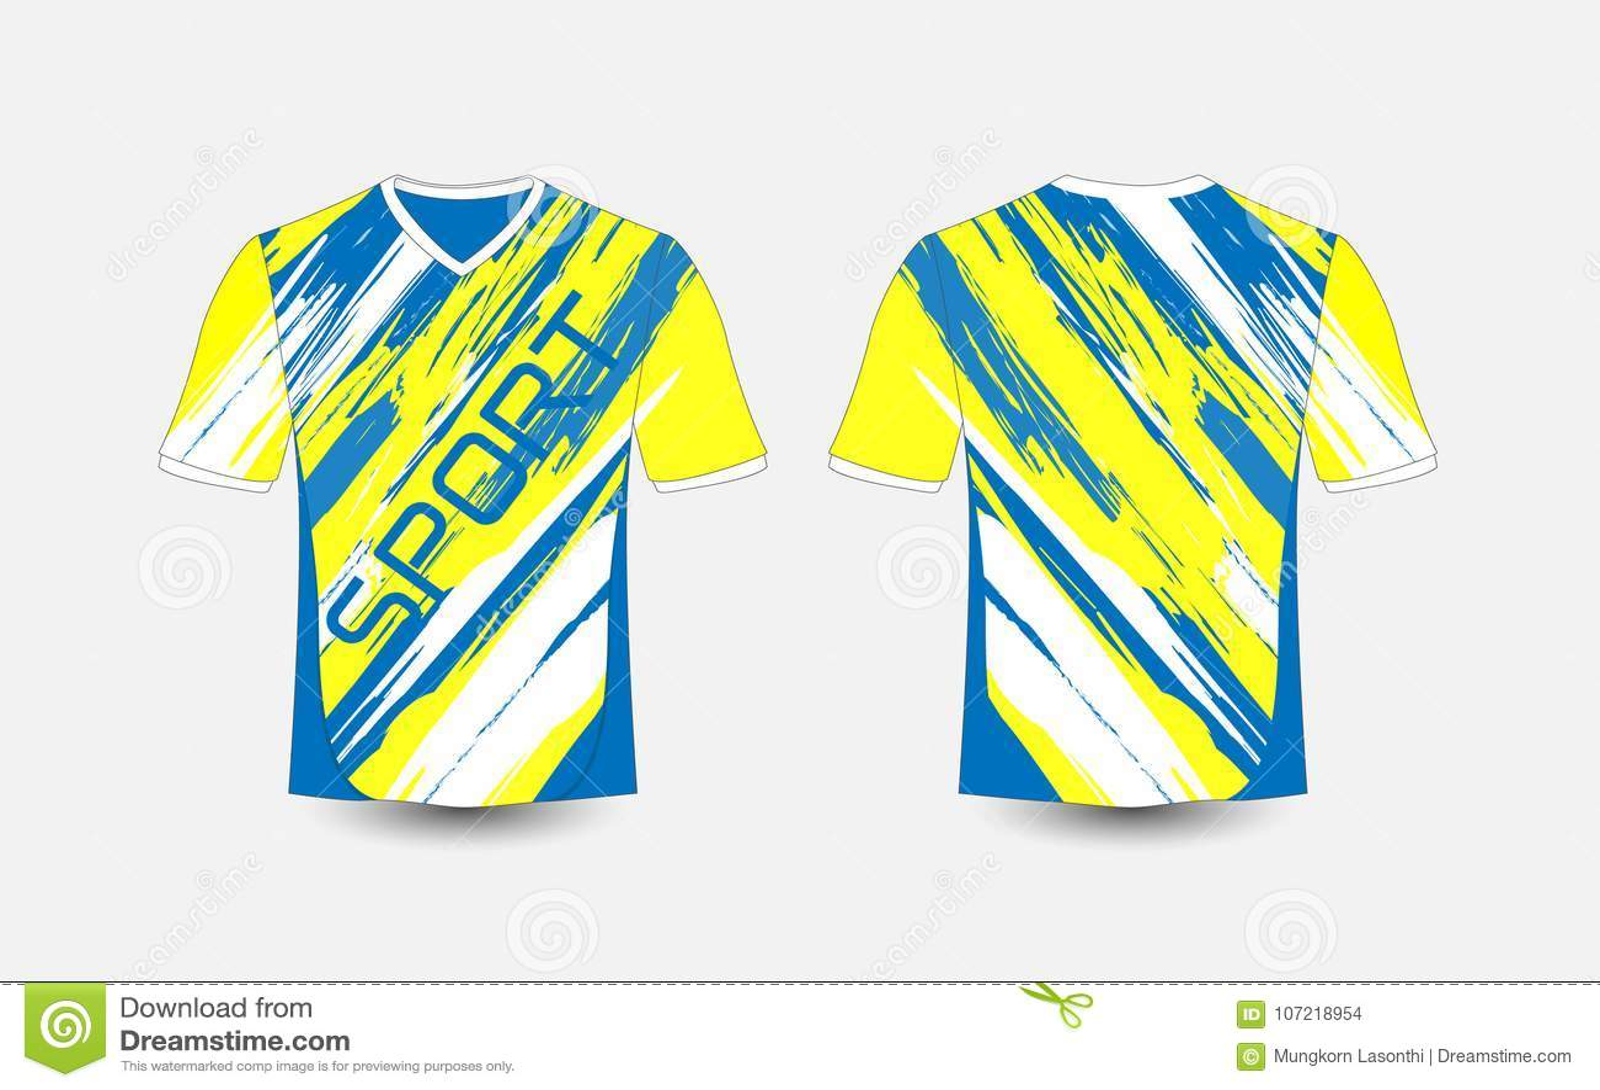 Blue and White stripe pattern sport football kits, jersey, t-shirt design template